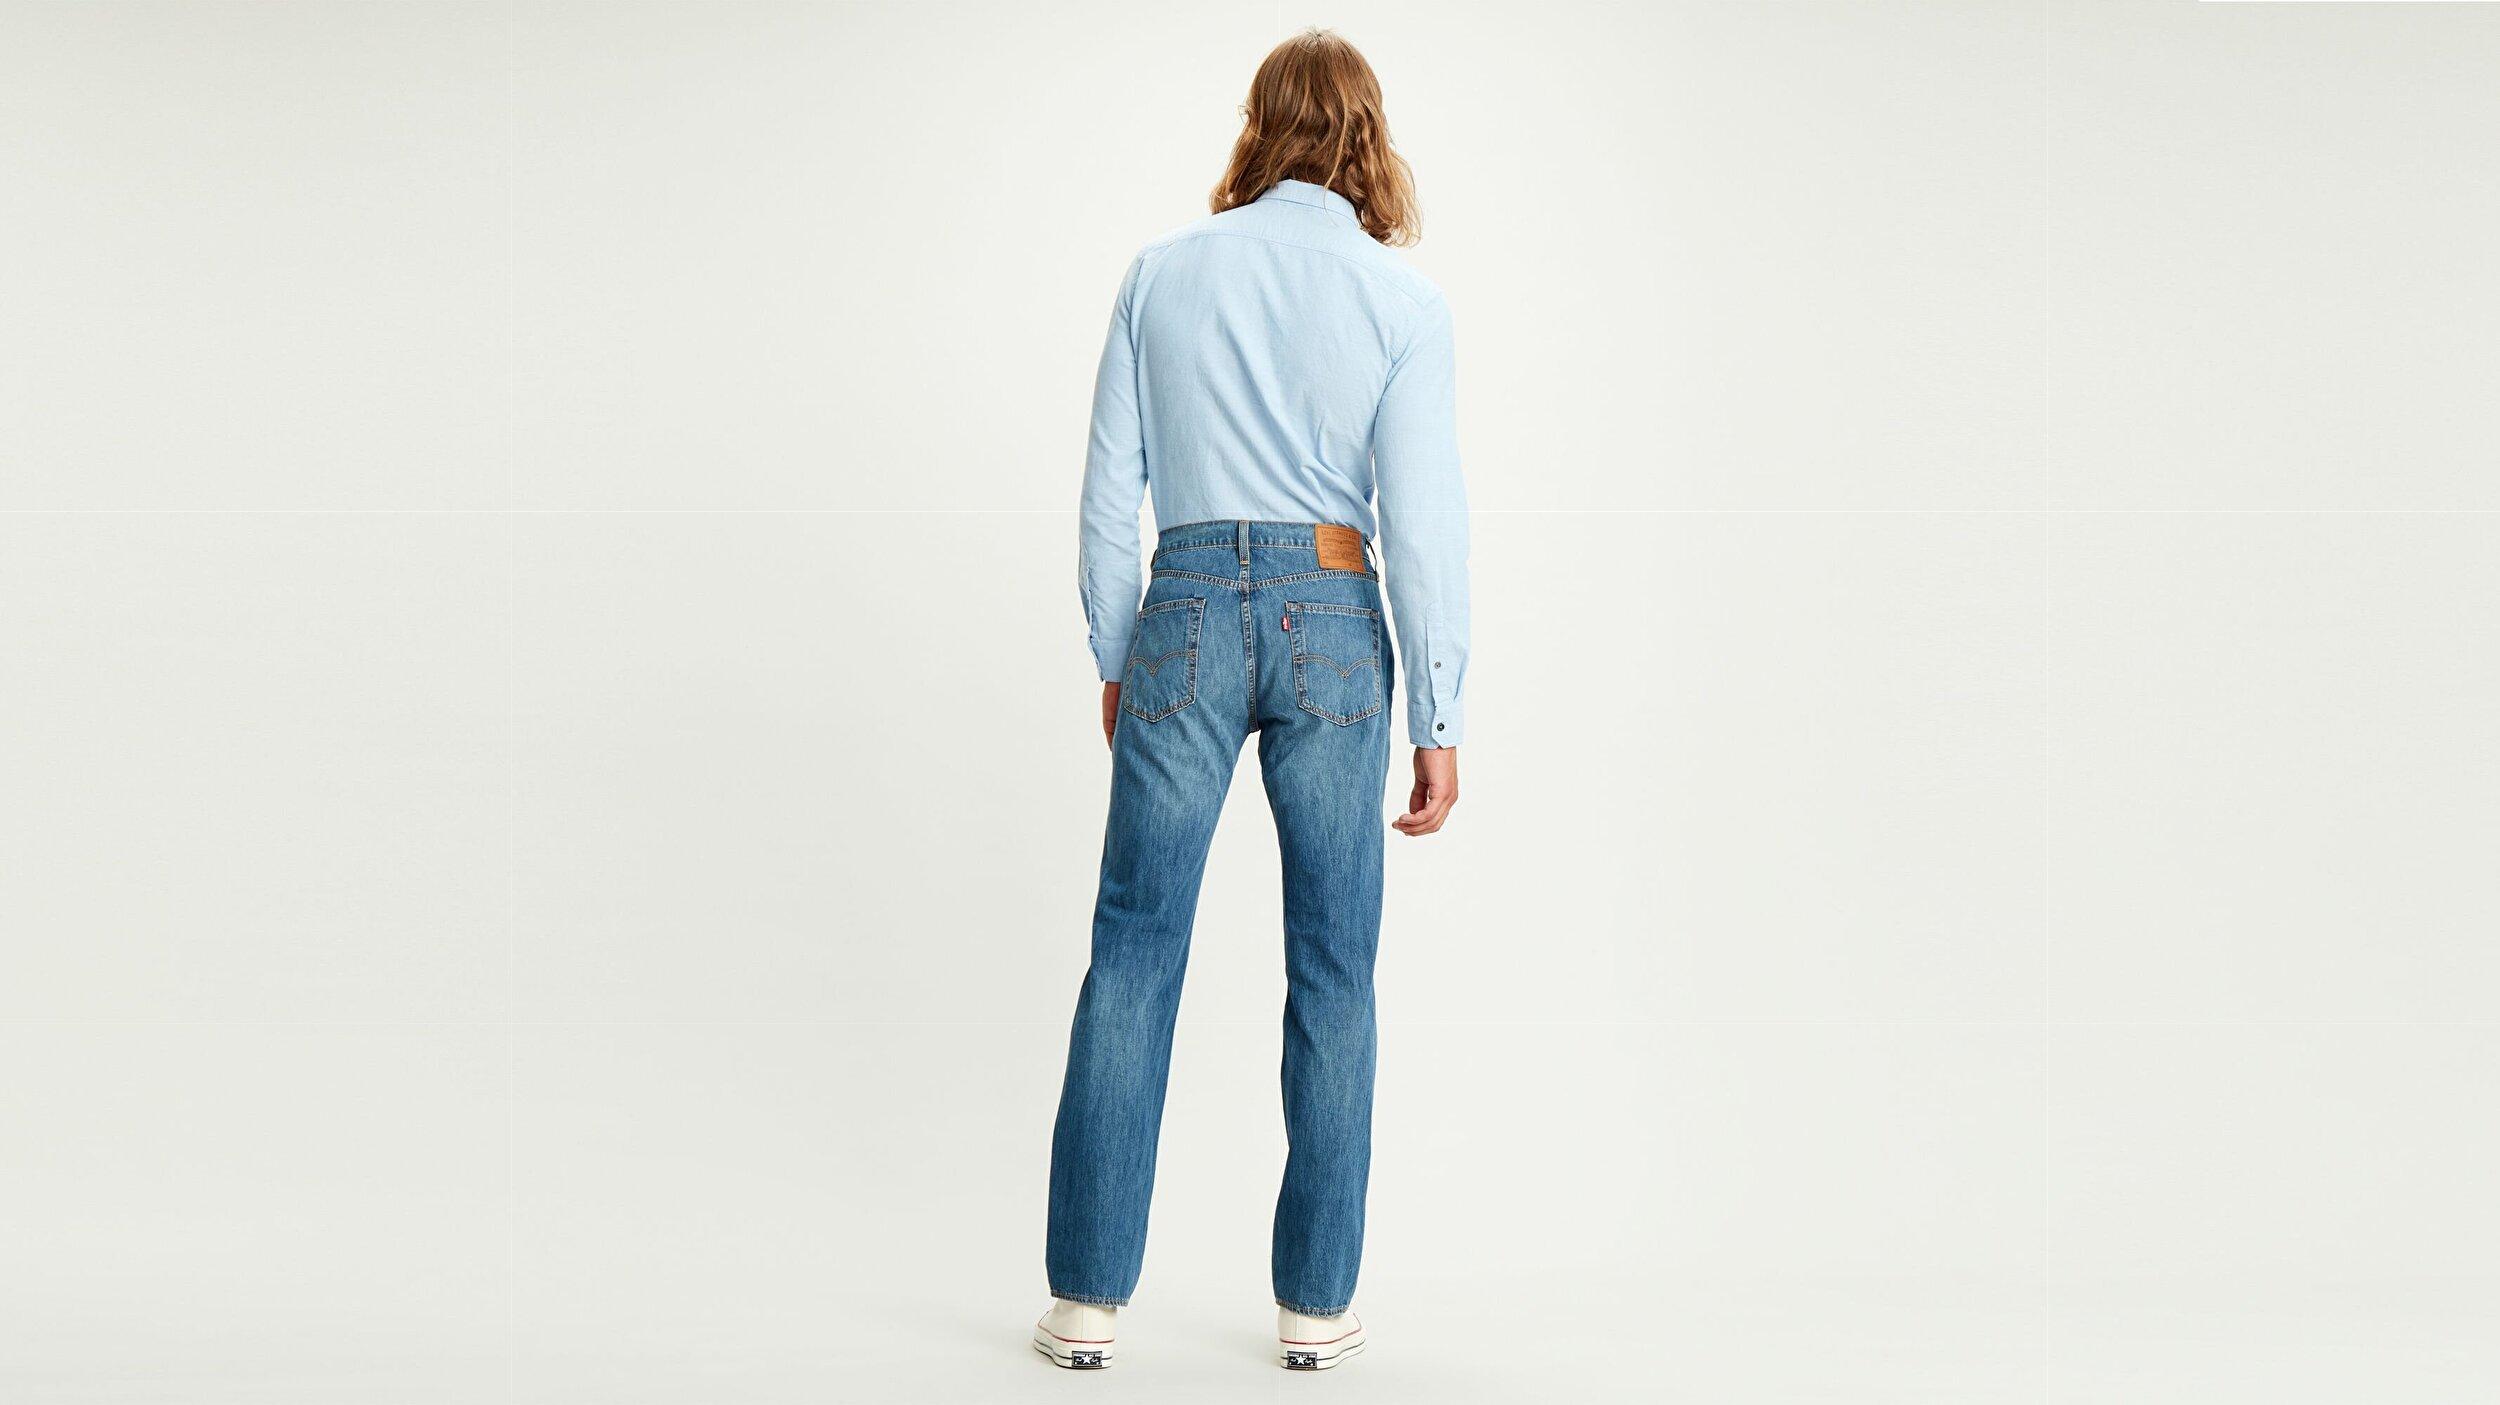 514™ Straight Fit Erkek Jean Pantolon-Matcha  Cool